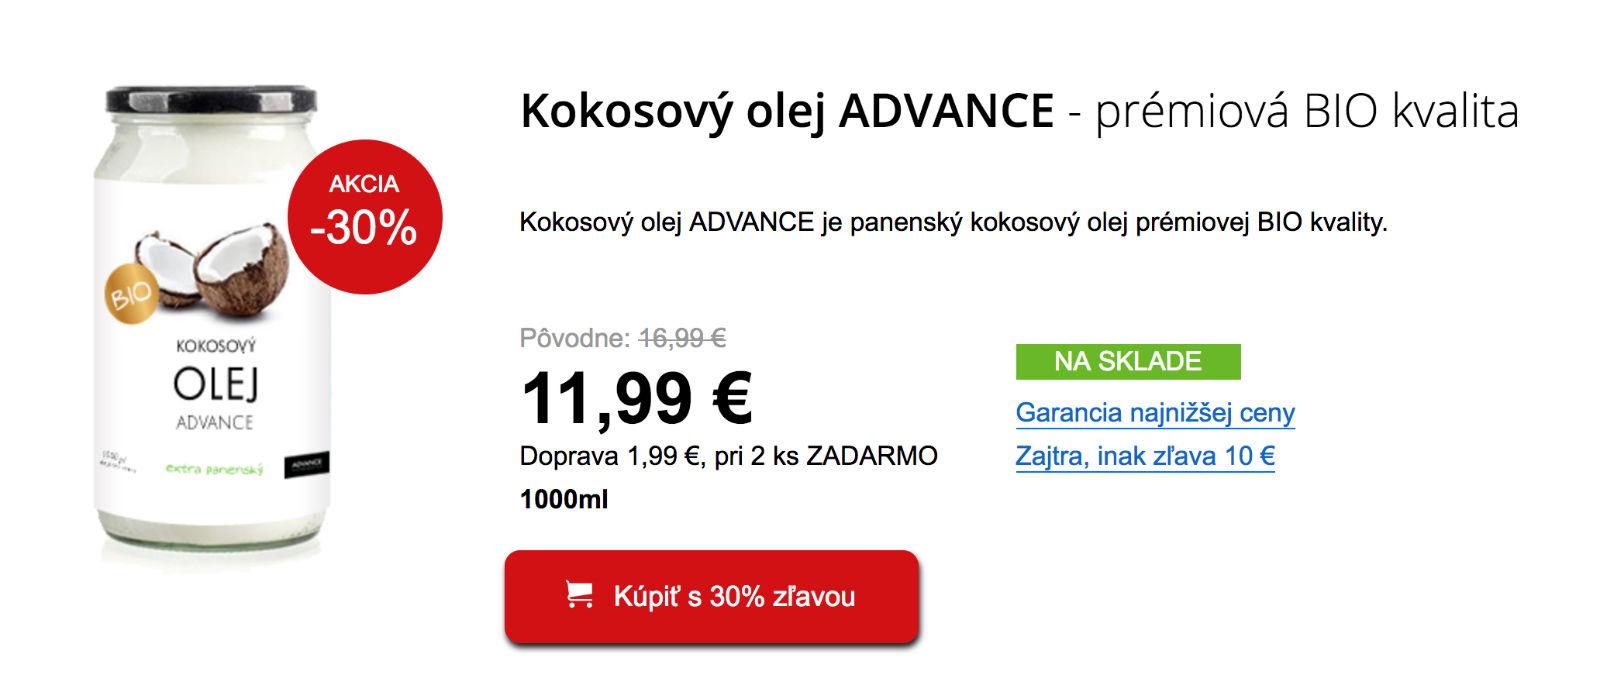 Kokosový olej Advance BIO, banner